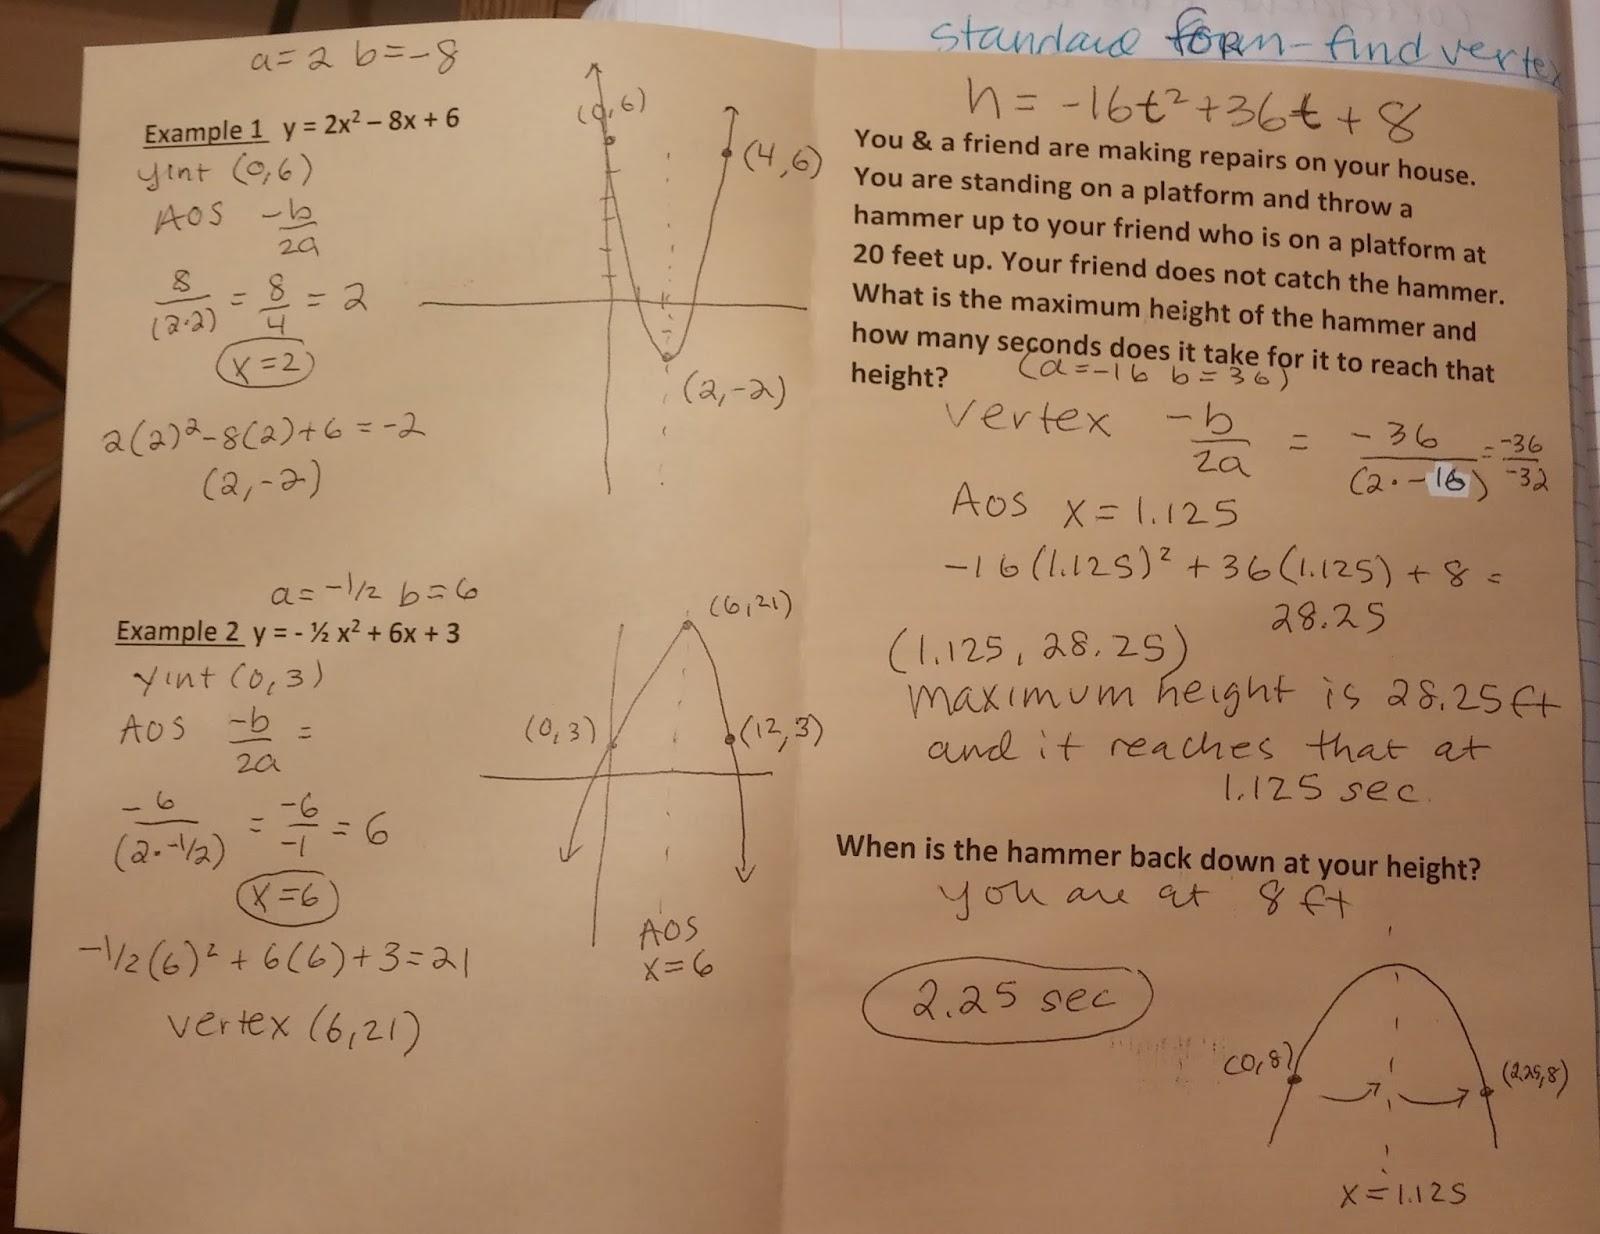 Beautiful Math Standard Form